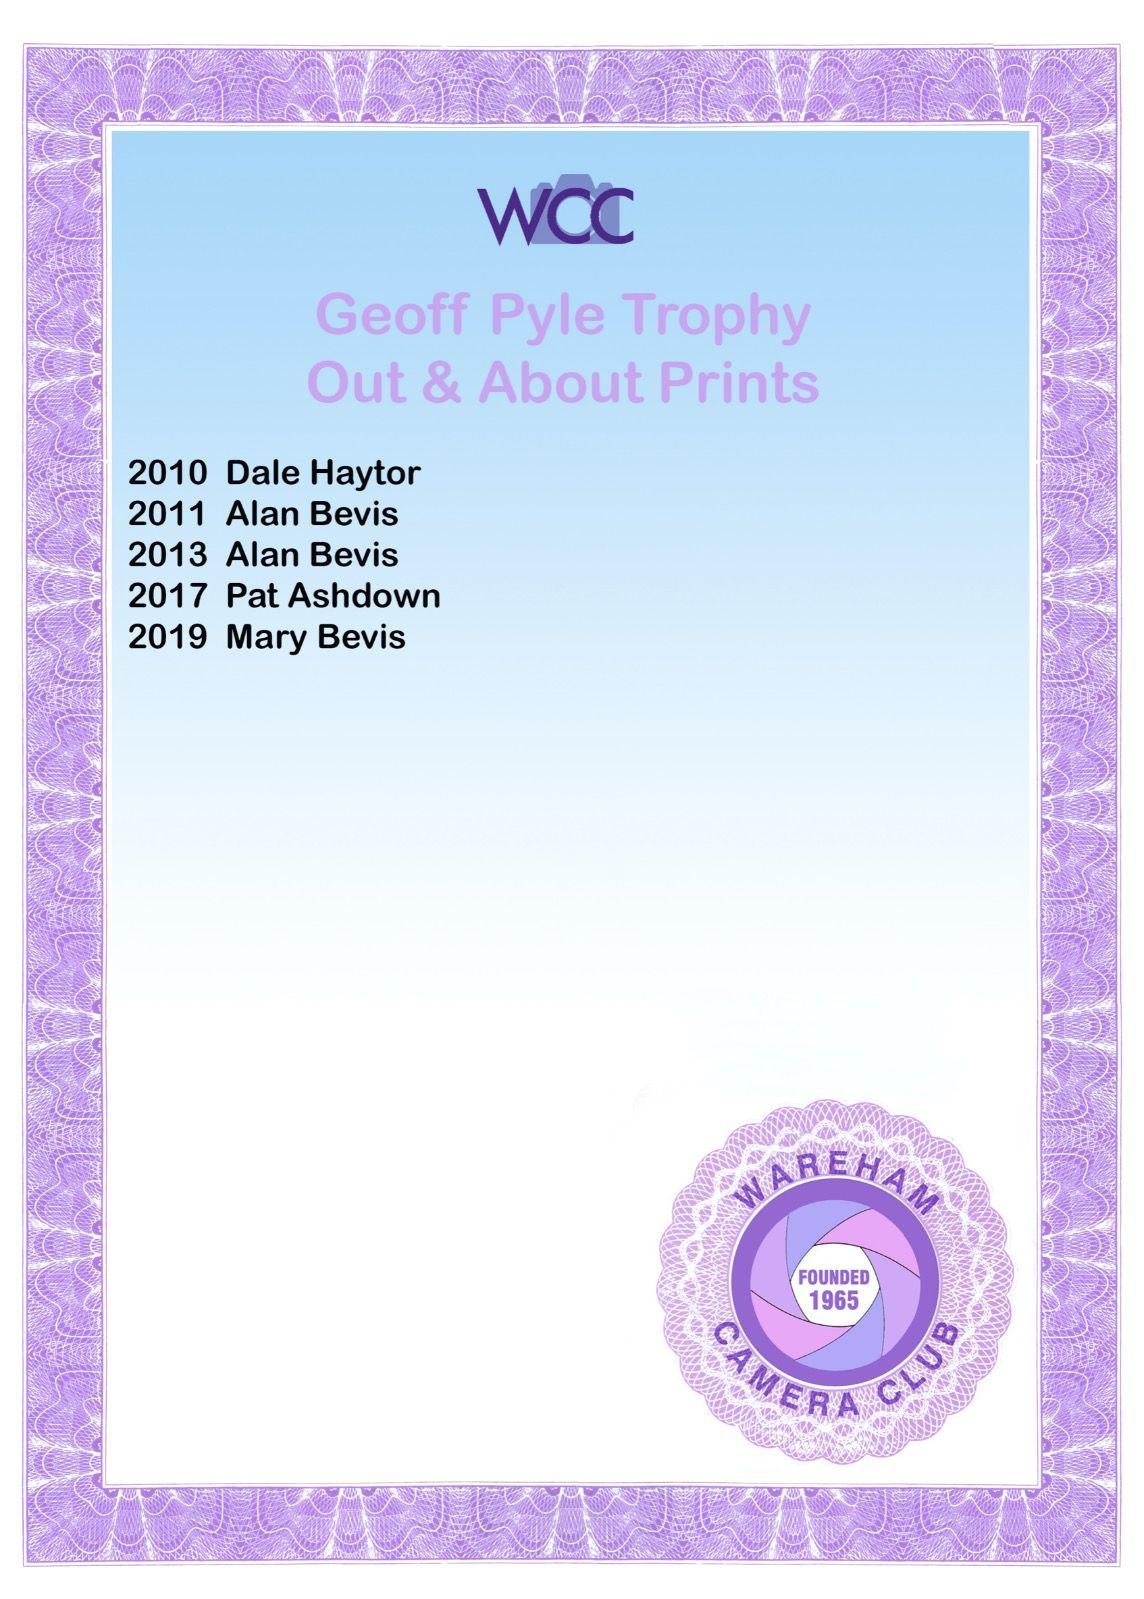 Geoff Pyle Prints